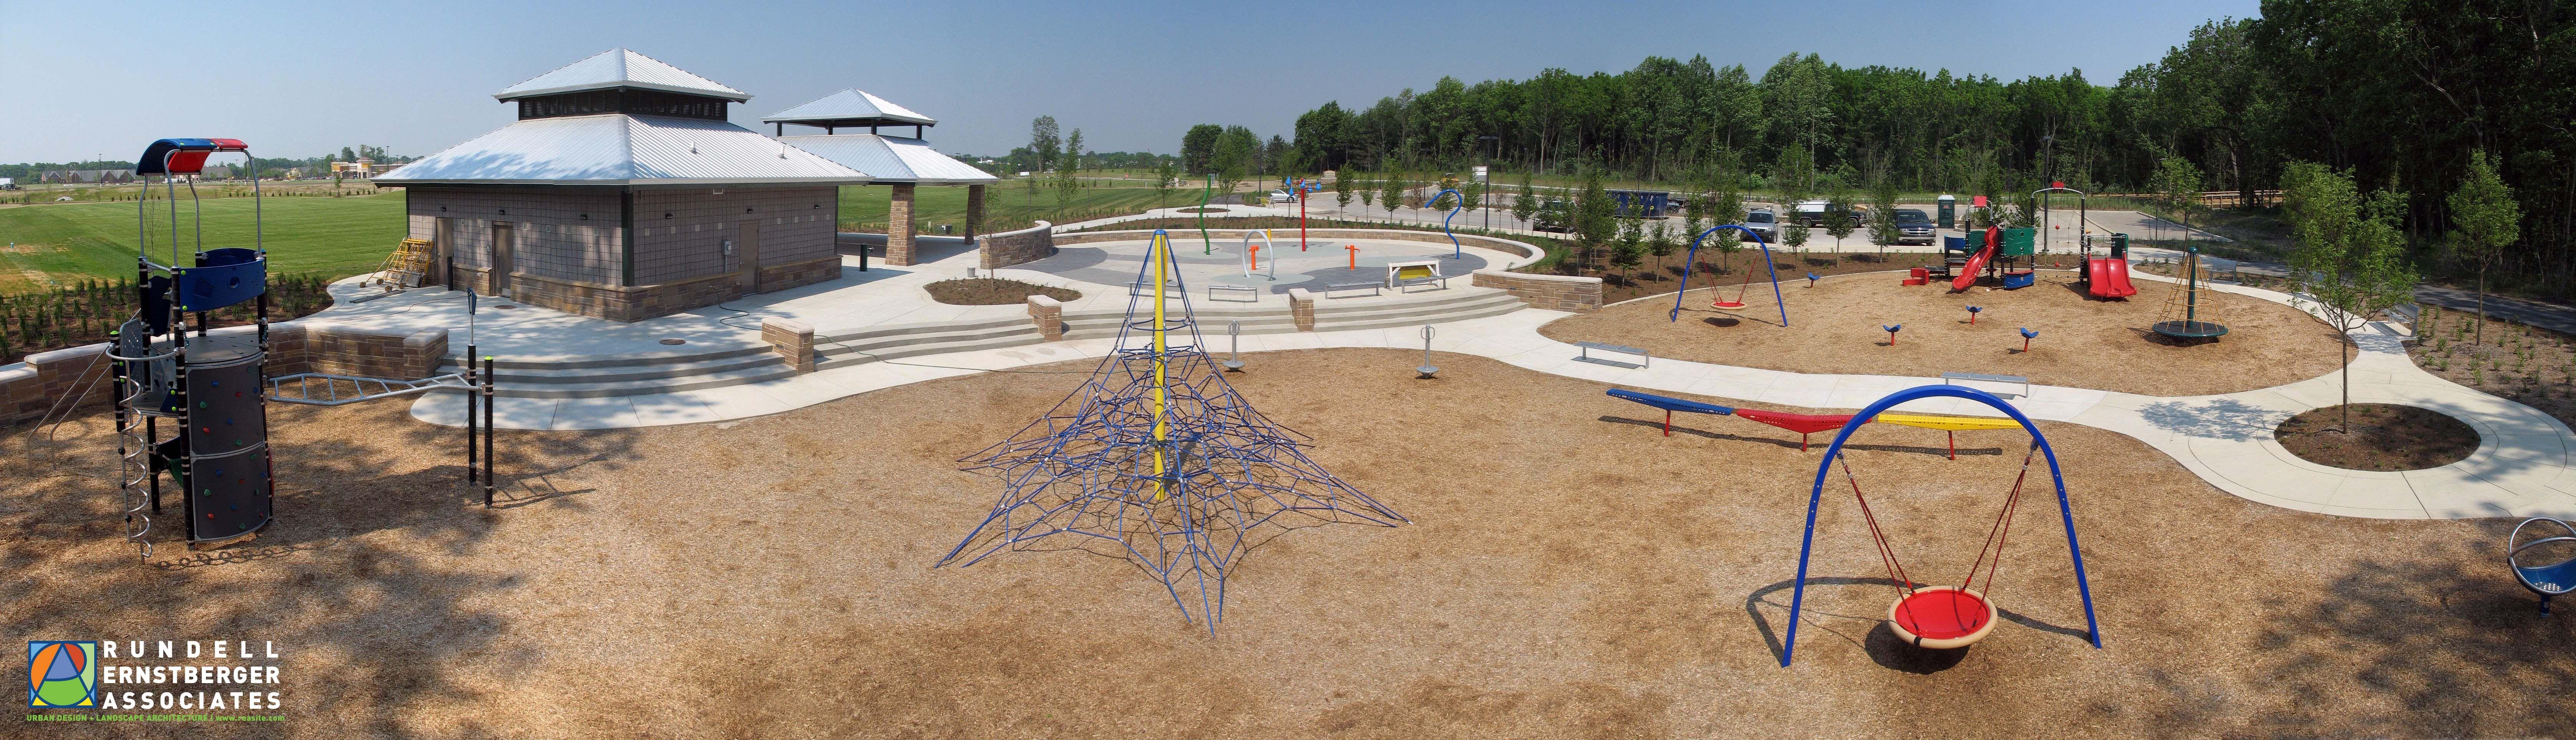 Playground Dr James A Dillon Park Noblesville Indiana Rundell Ernstberger Associates Open Space Playground Park